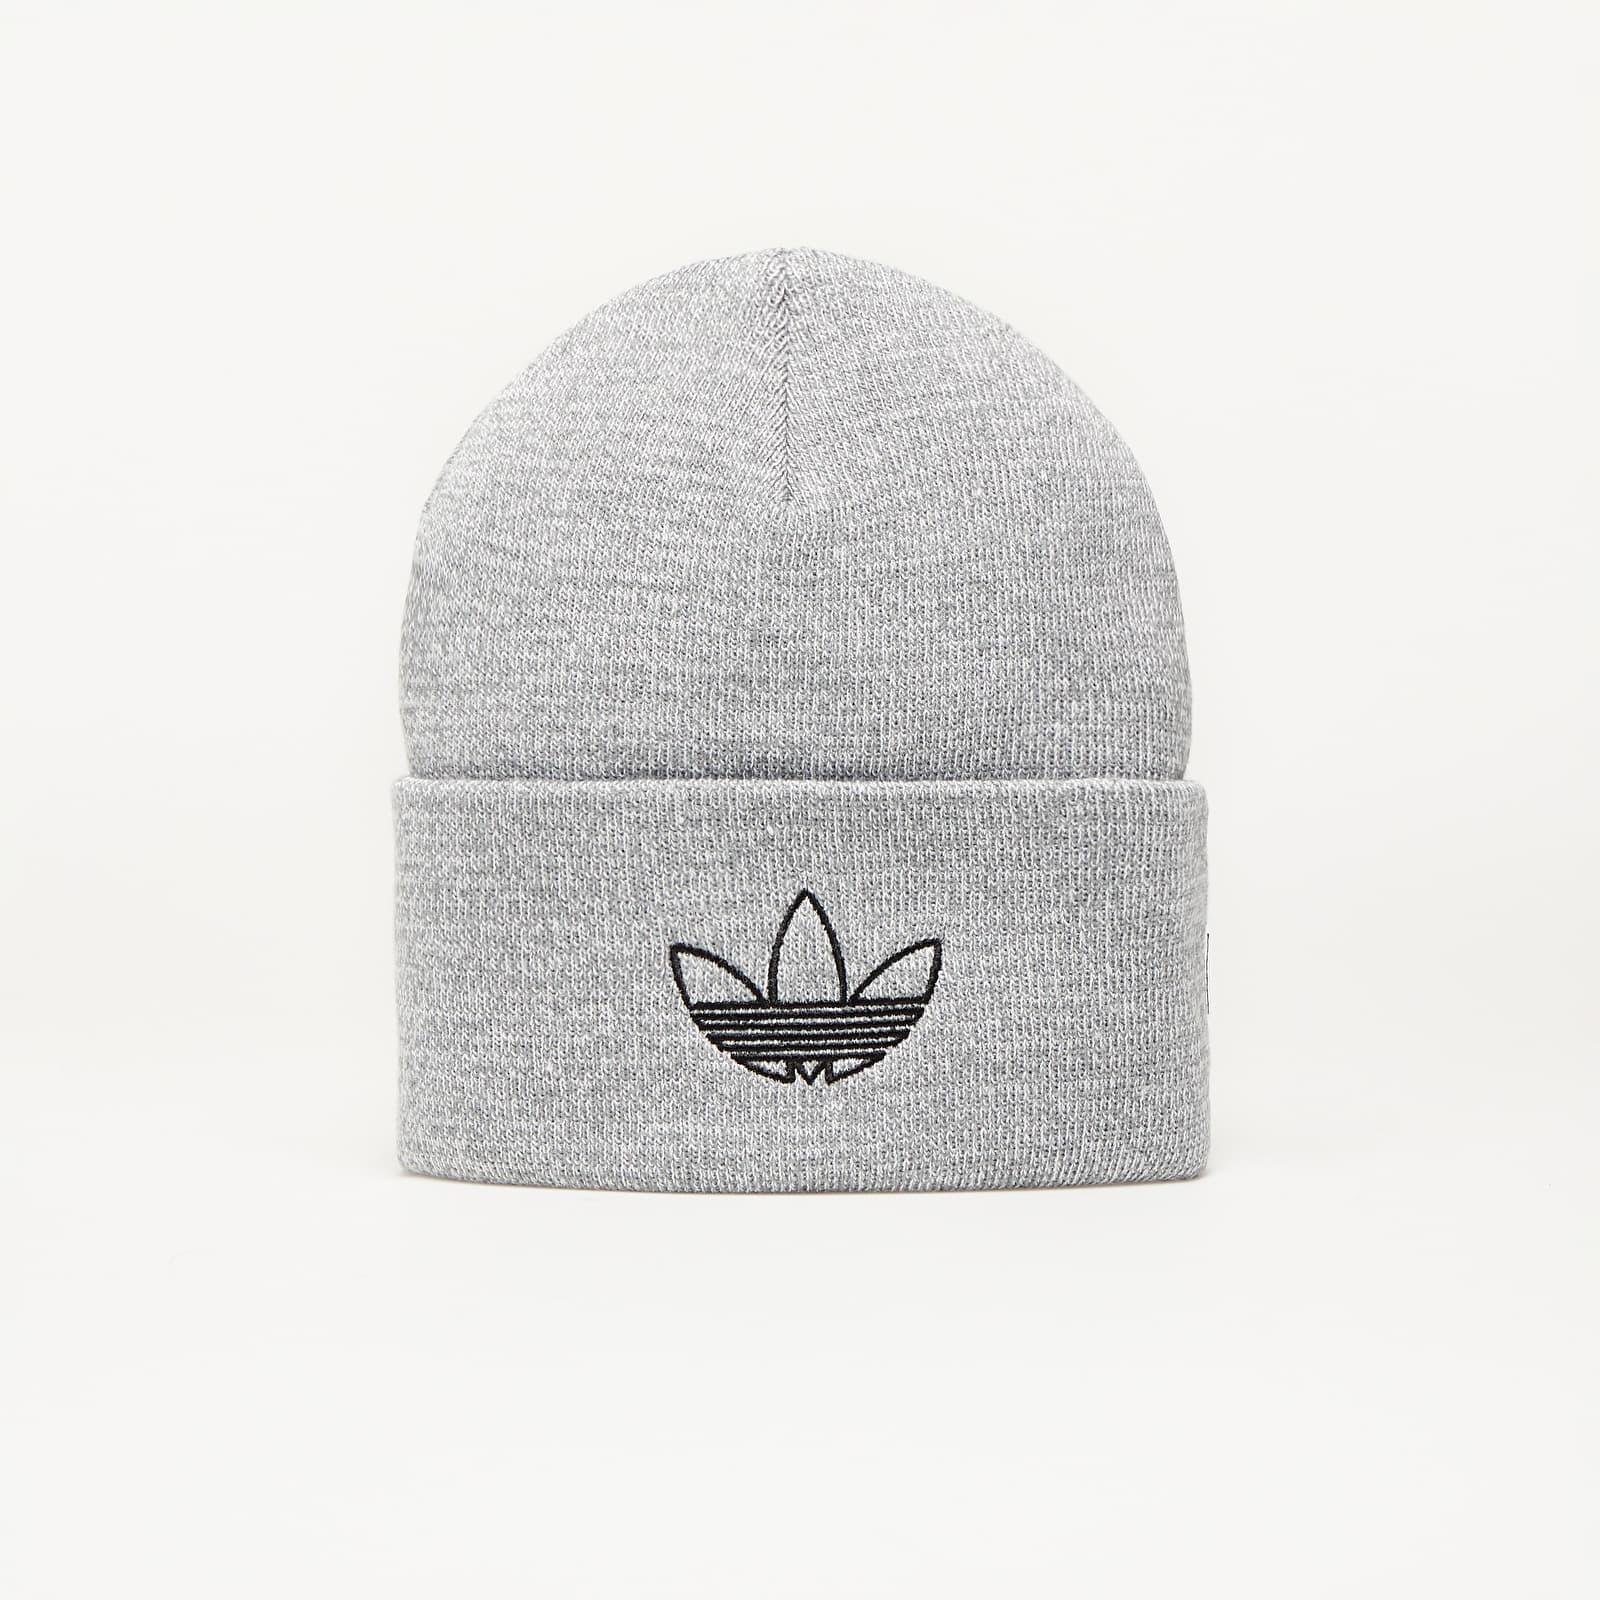 Hats adidas Outline Cuff Multi Solid Grey/ Silvmt